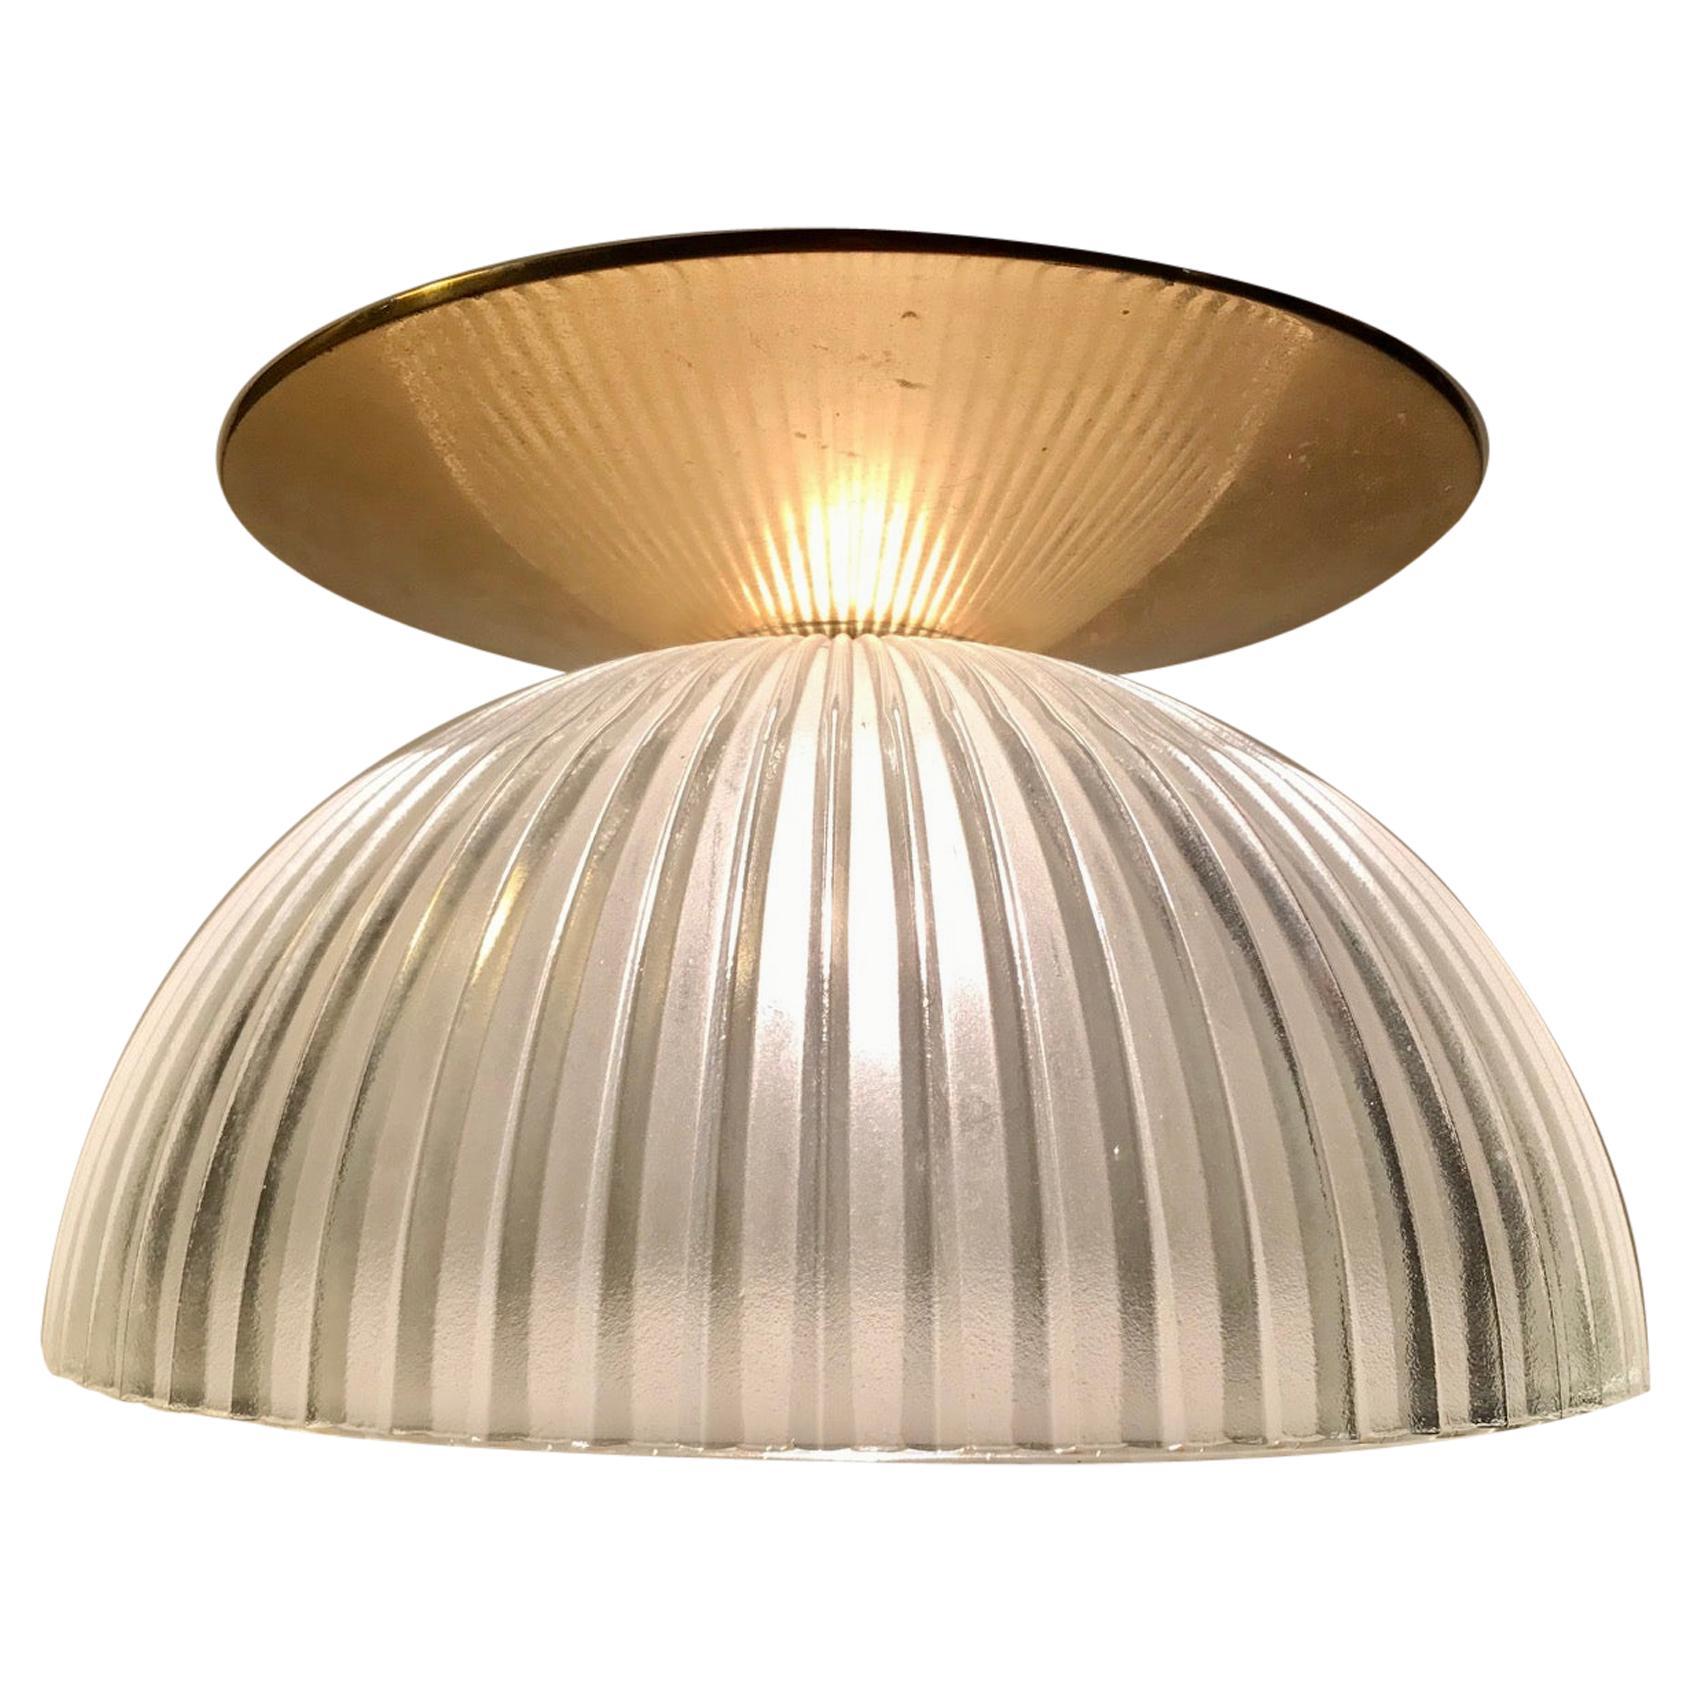 Scandinavian Fluted Glass and Brass Ceiling Lamp, 1970s